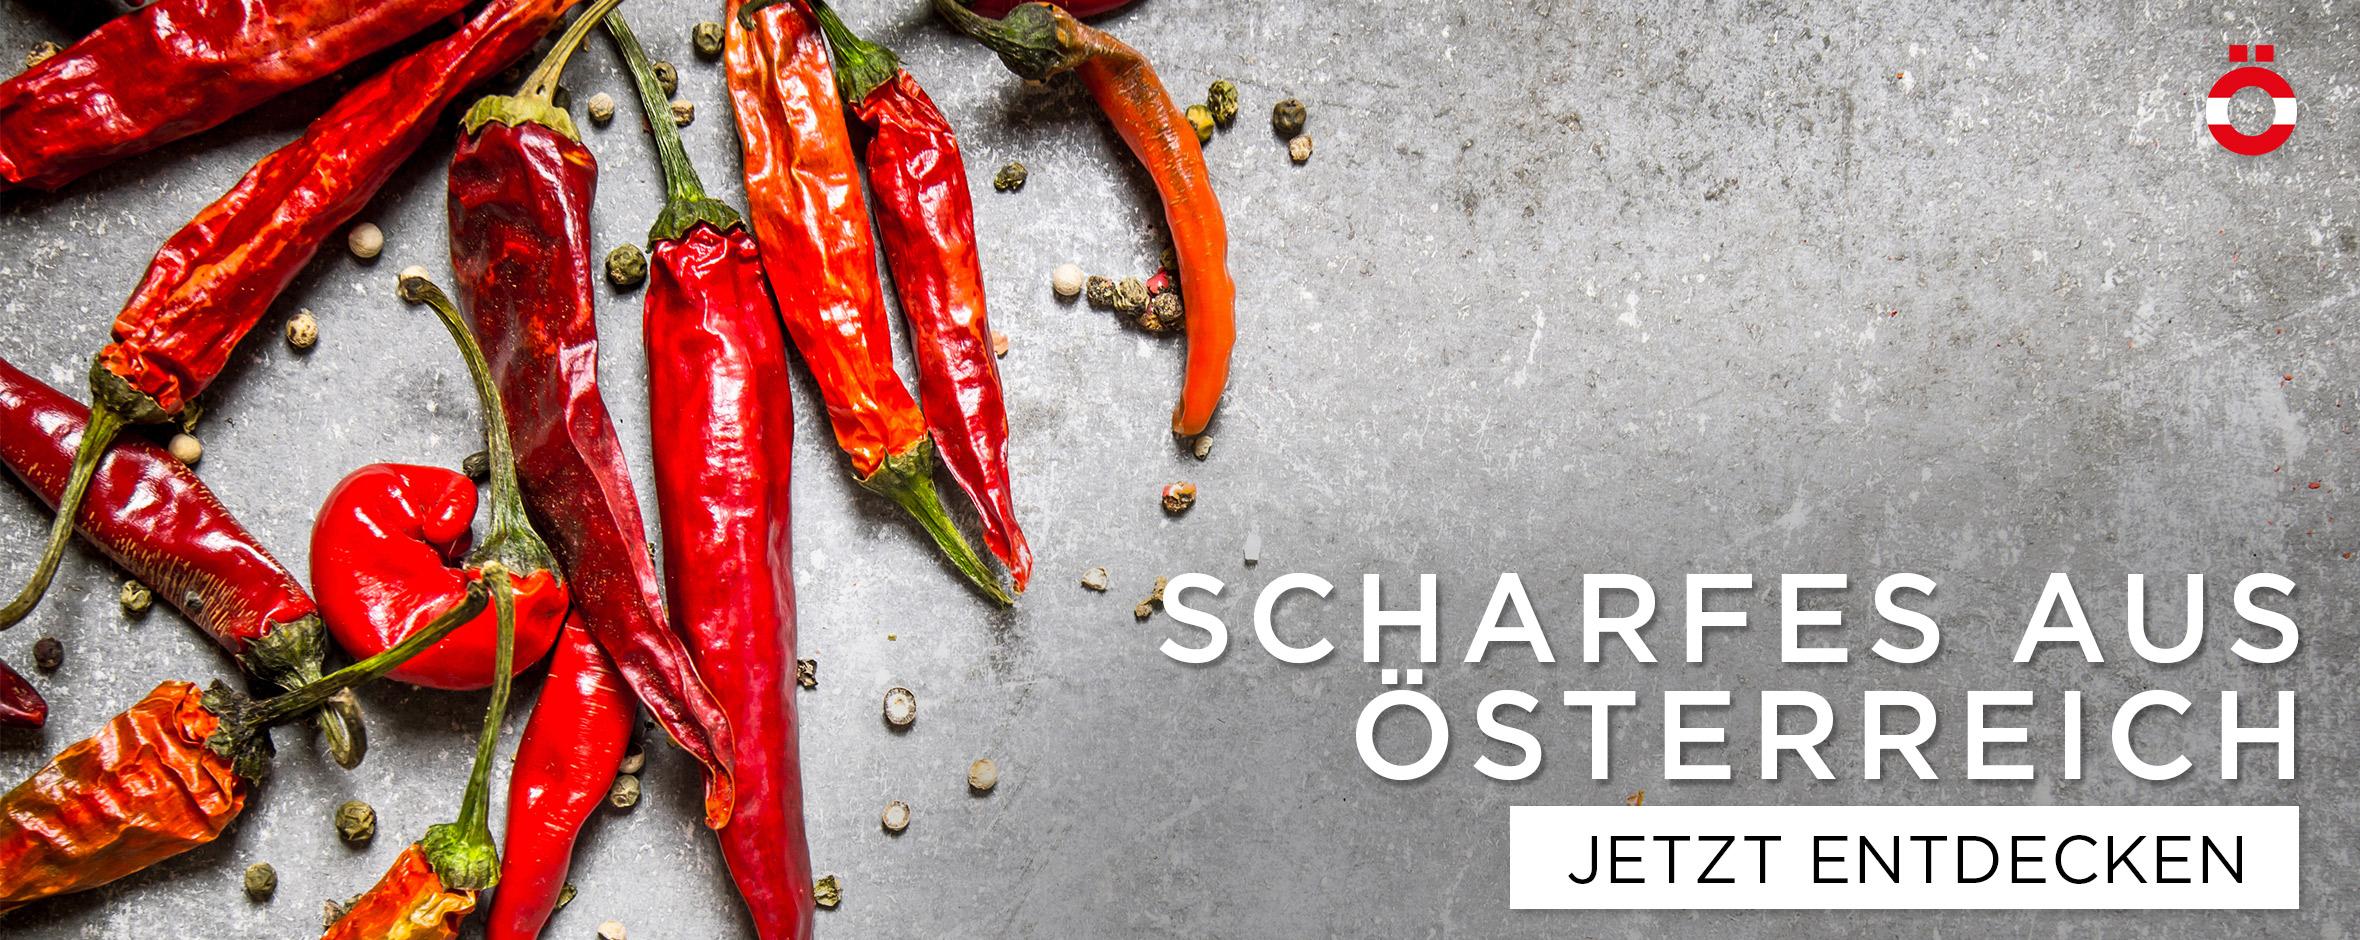 Scharfes aus Österreich - shöpping.at